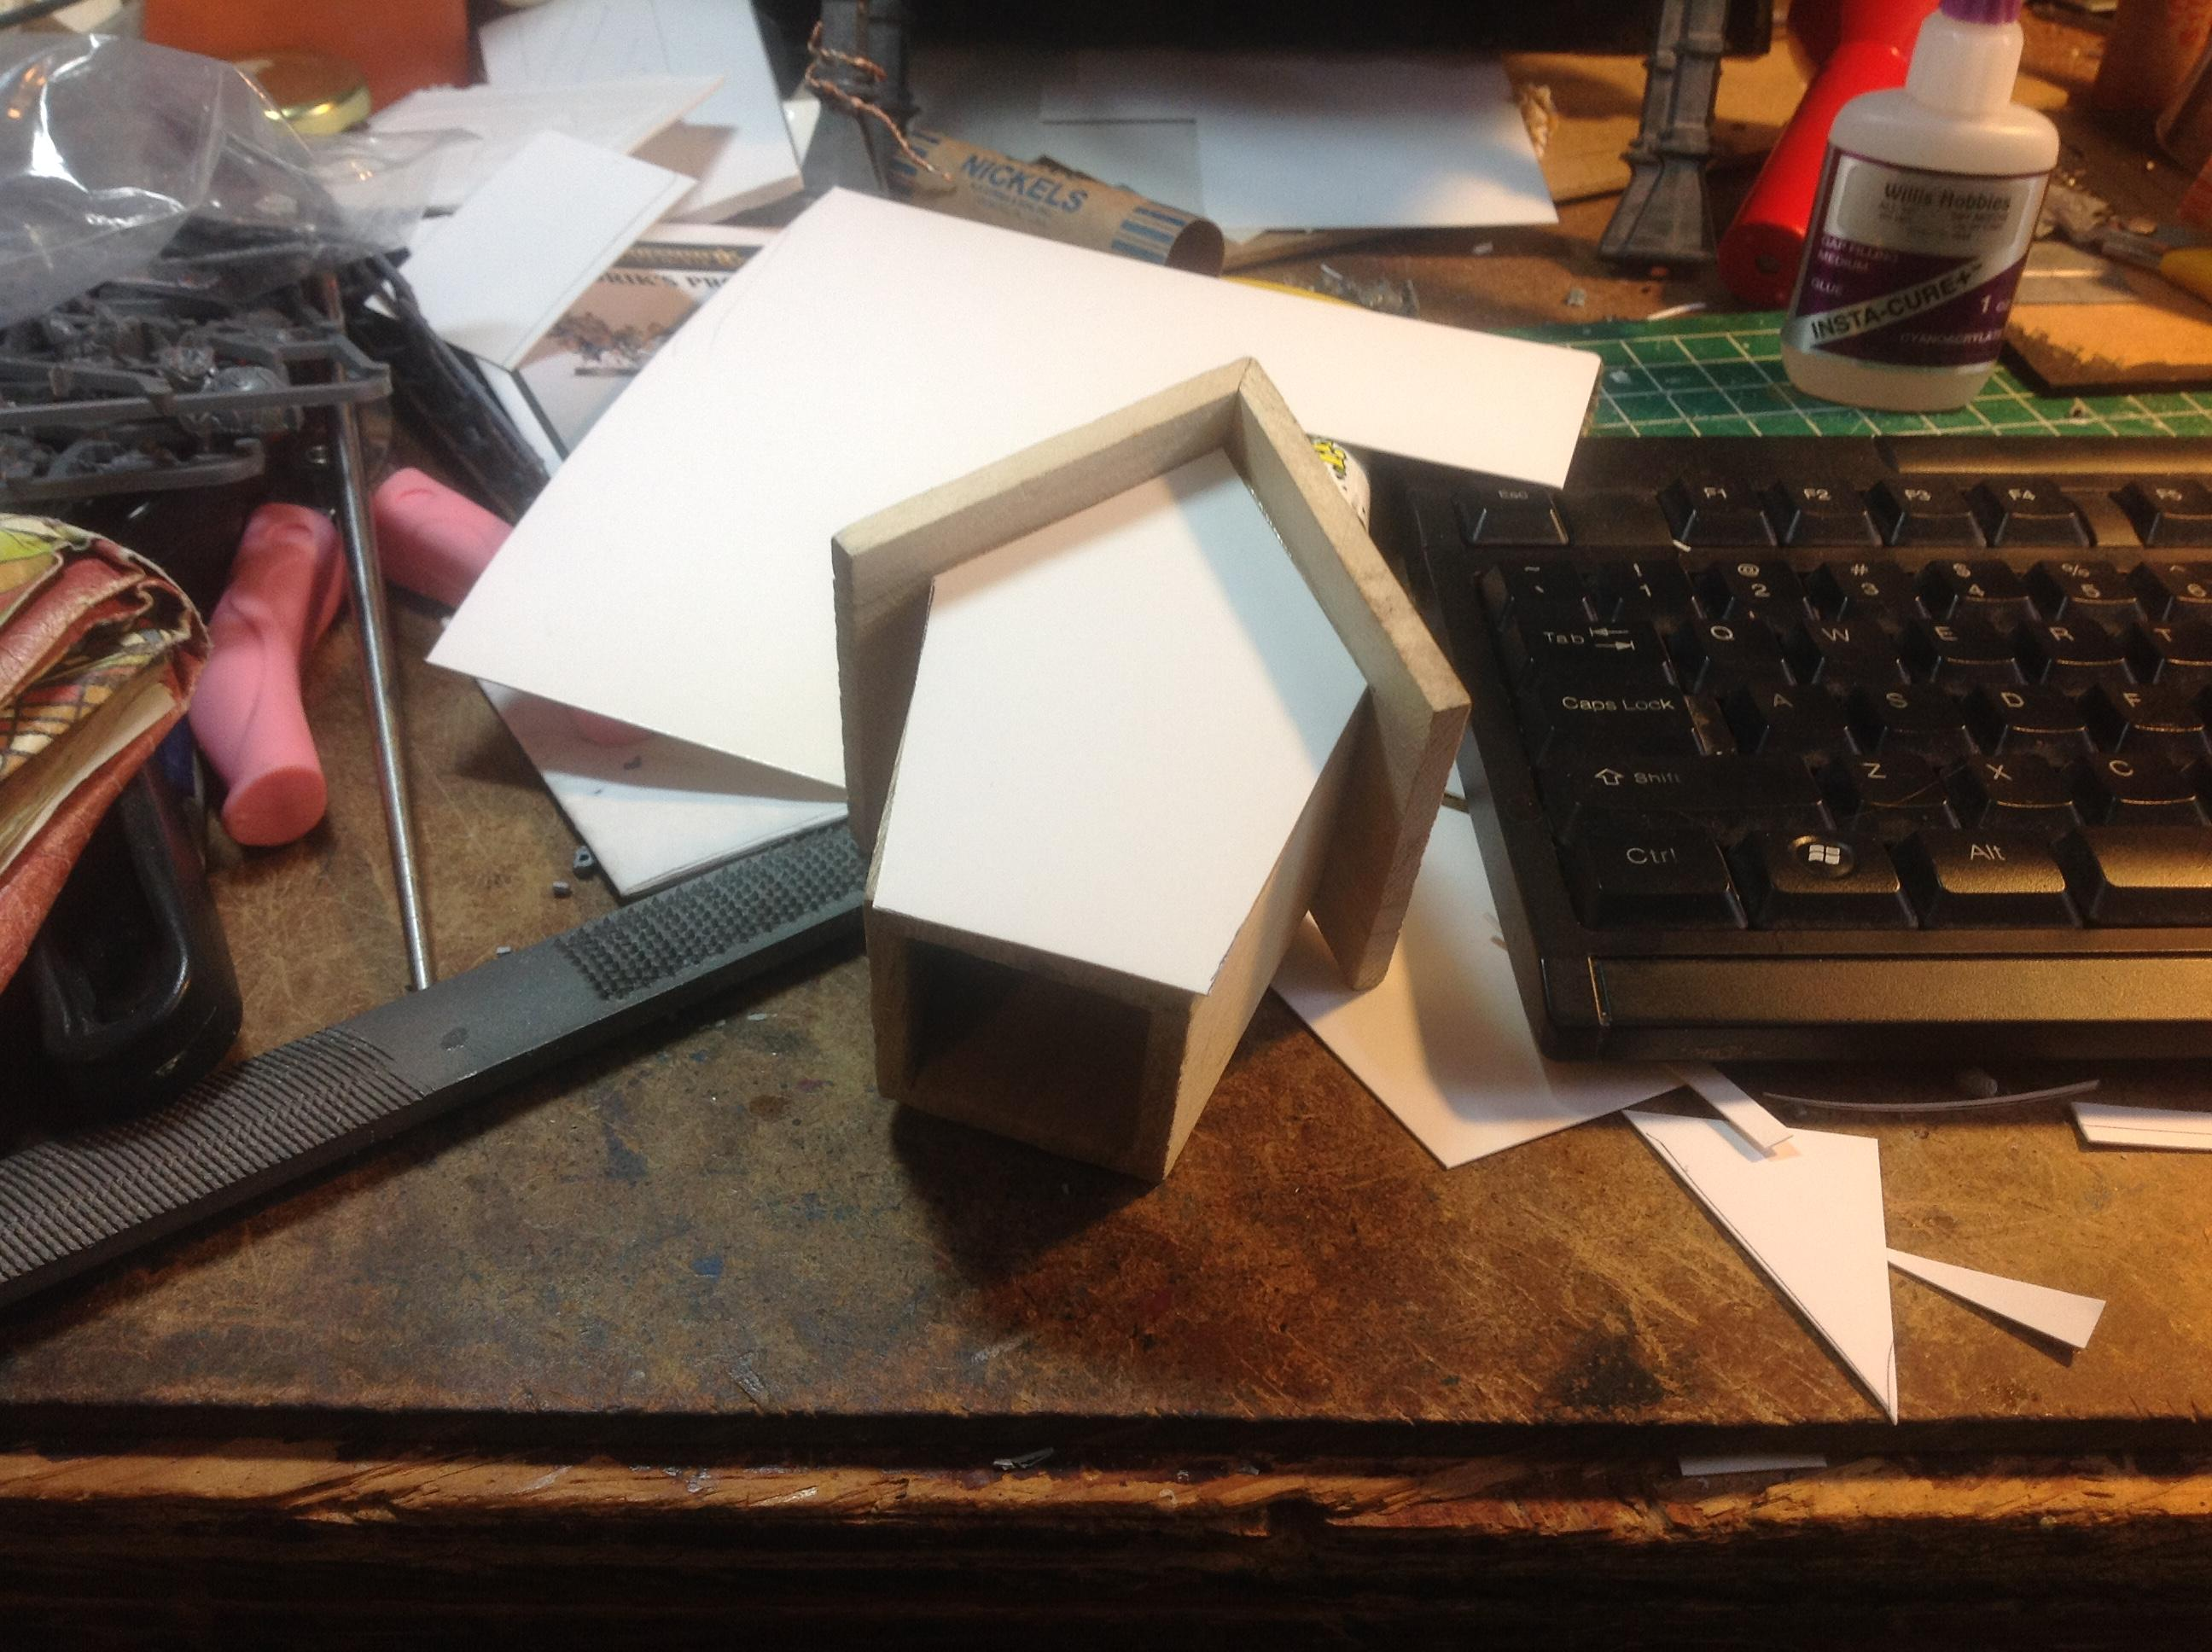 Birdhouse, Cardstock, Easy, Inq28, Inquisimunda, Kill Team, Killteam, Kitbash, Necromunda, Papercraft, Spacehulk, Terrain, Vent, Waaazag, Warhammer 40,000, Wood, Work In Progress